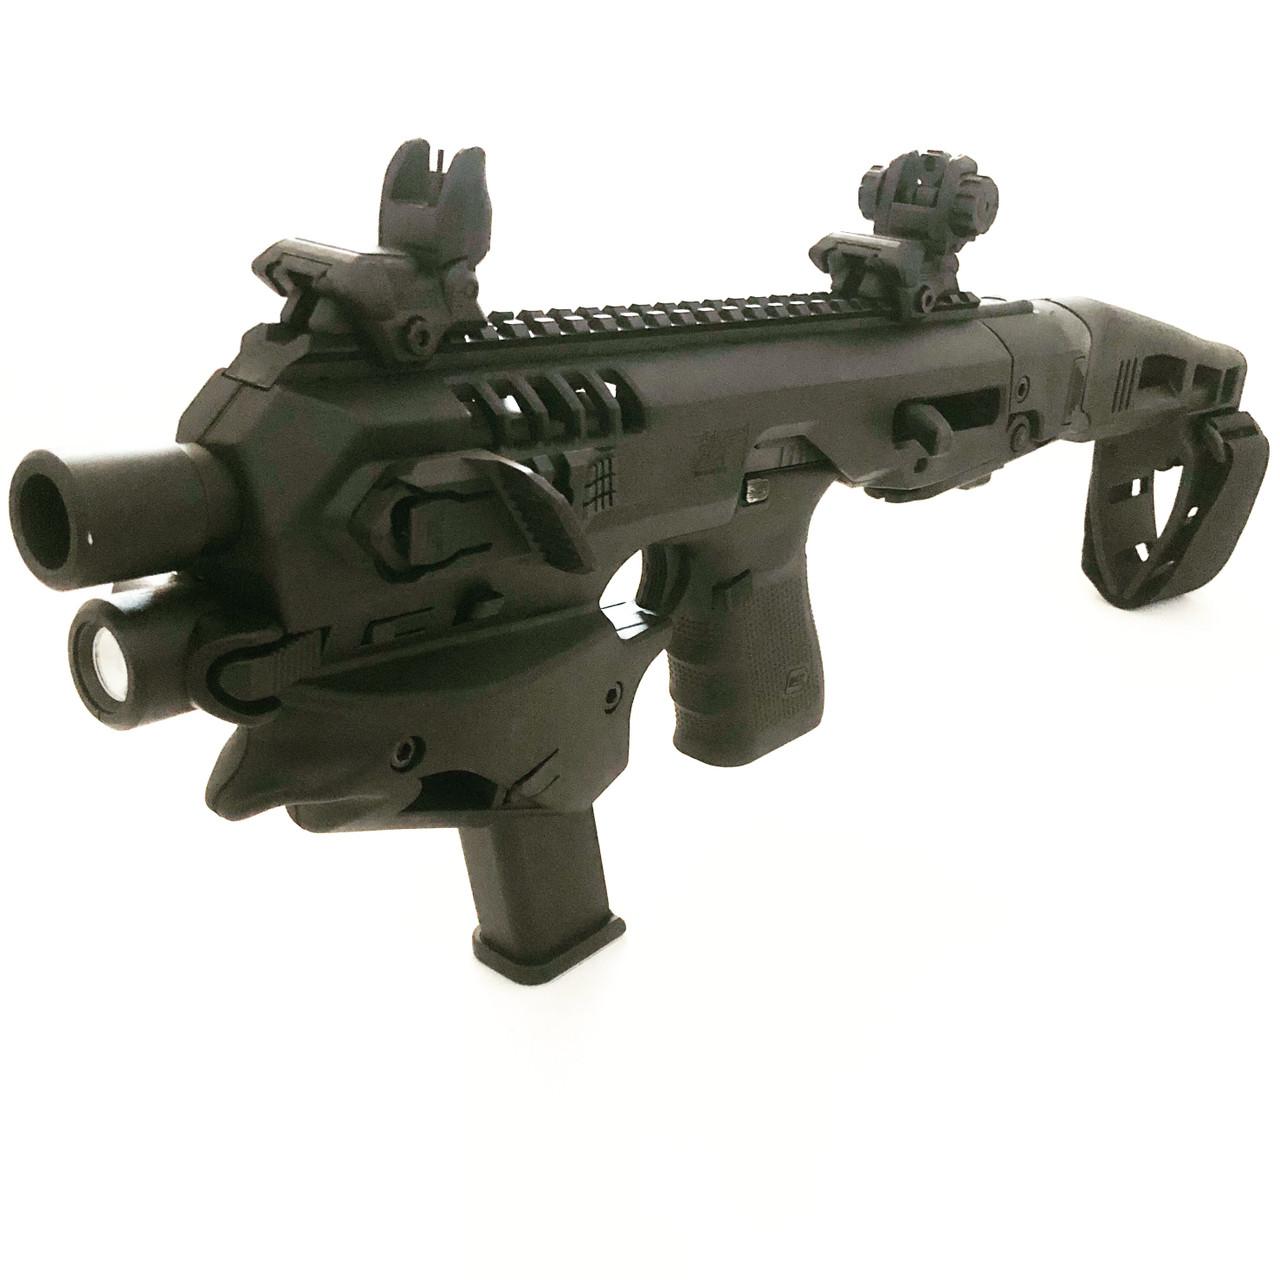 MCK Micro Conversion Kit Stage 1 Combo ( Glock 17/19/19X/22/23/31/32/45)